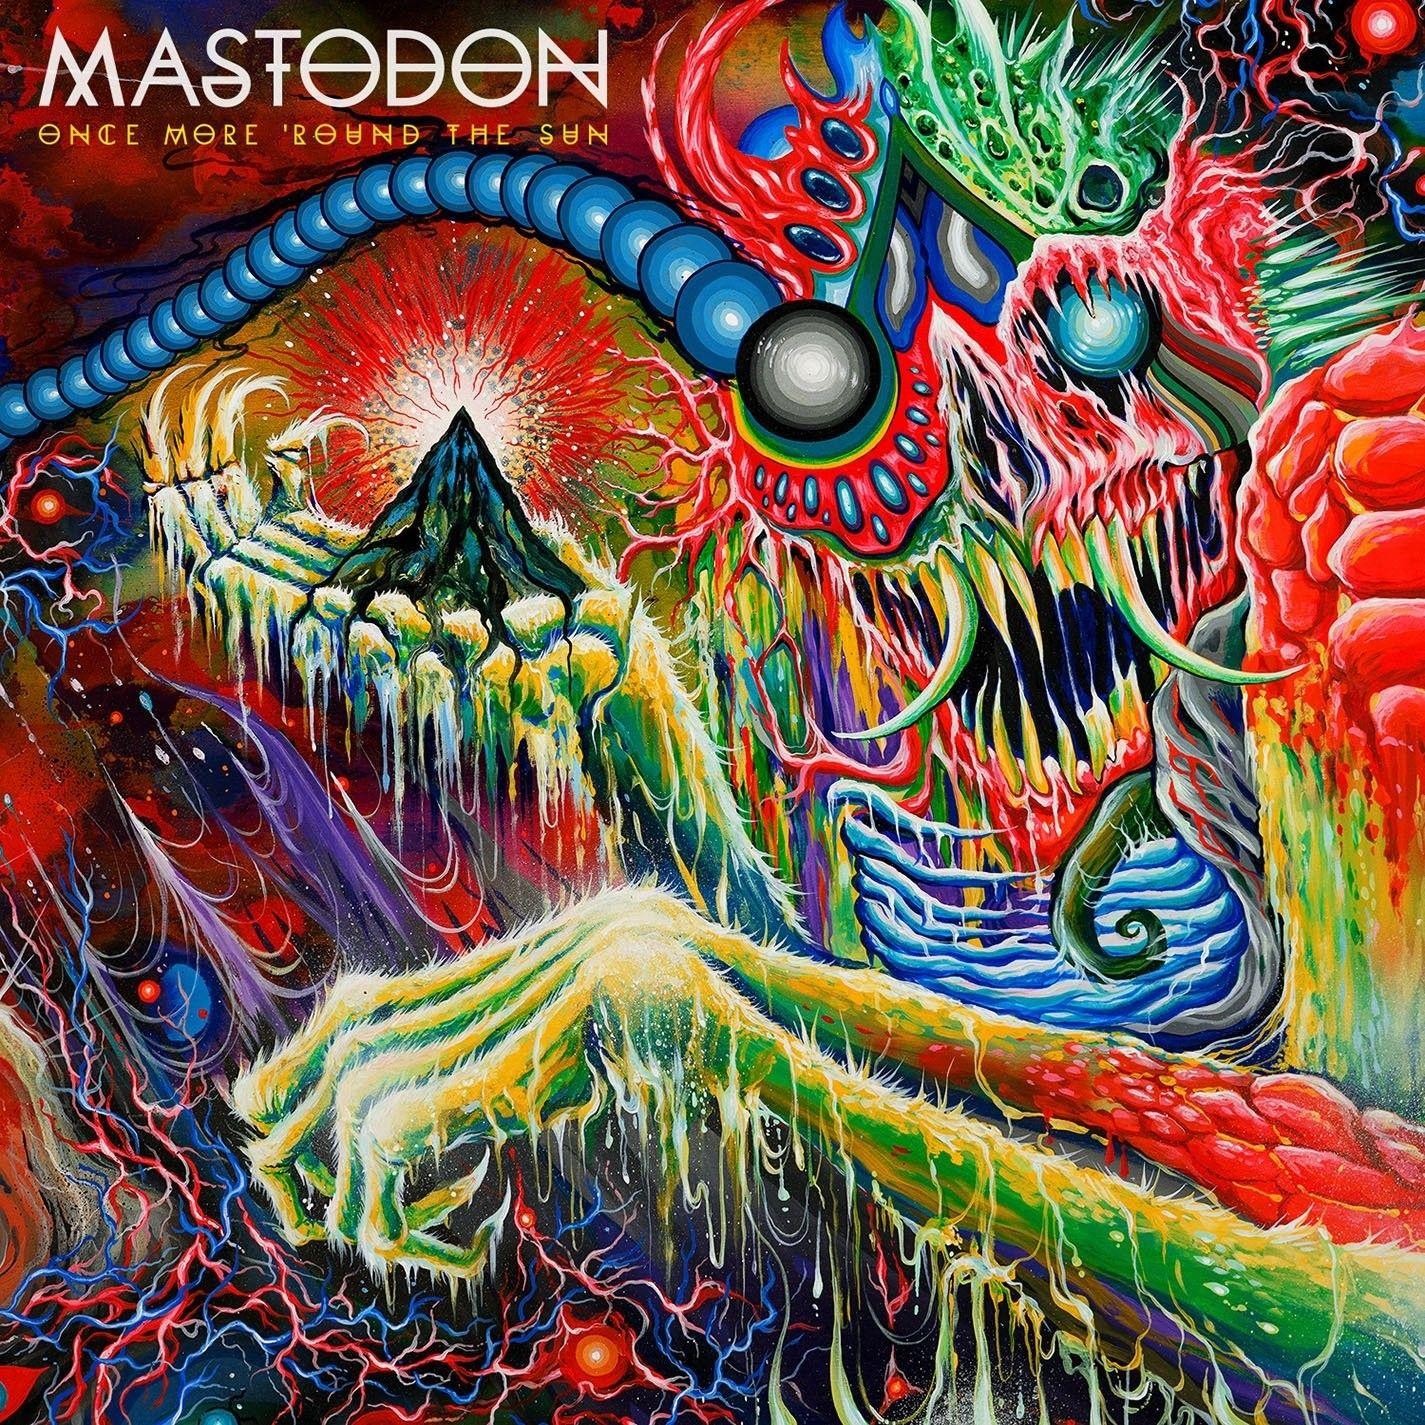 Watch: Skinner Talks Album Artwork with Mastodon